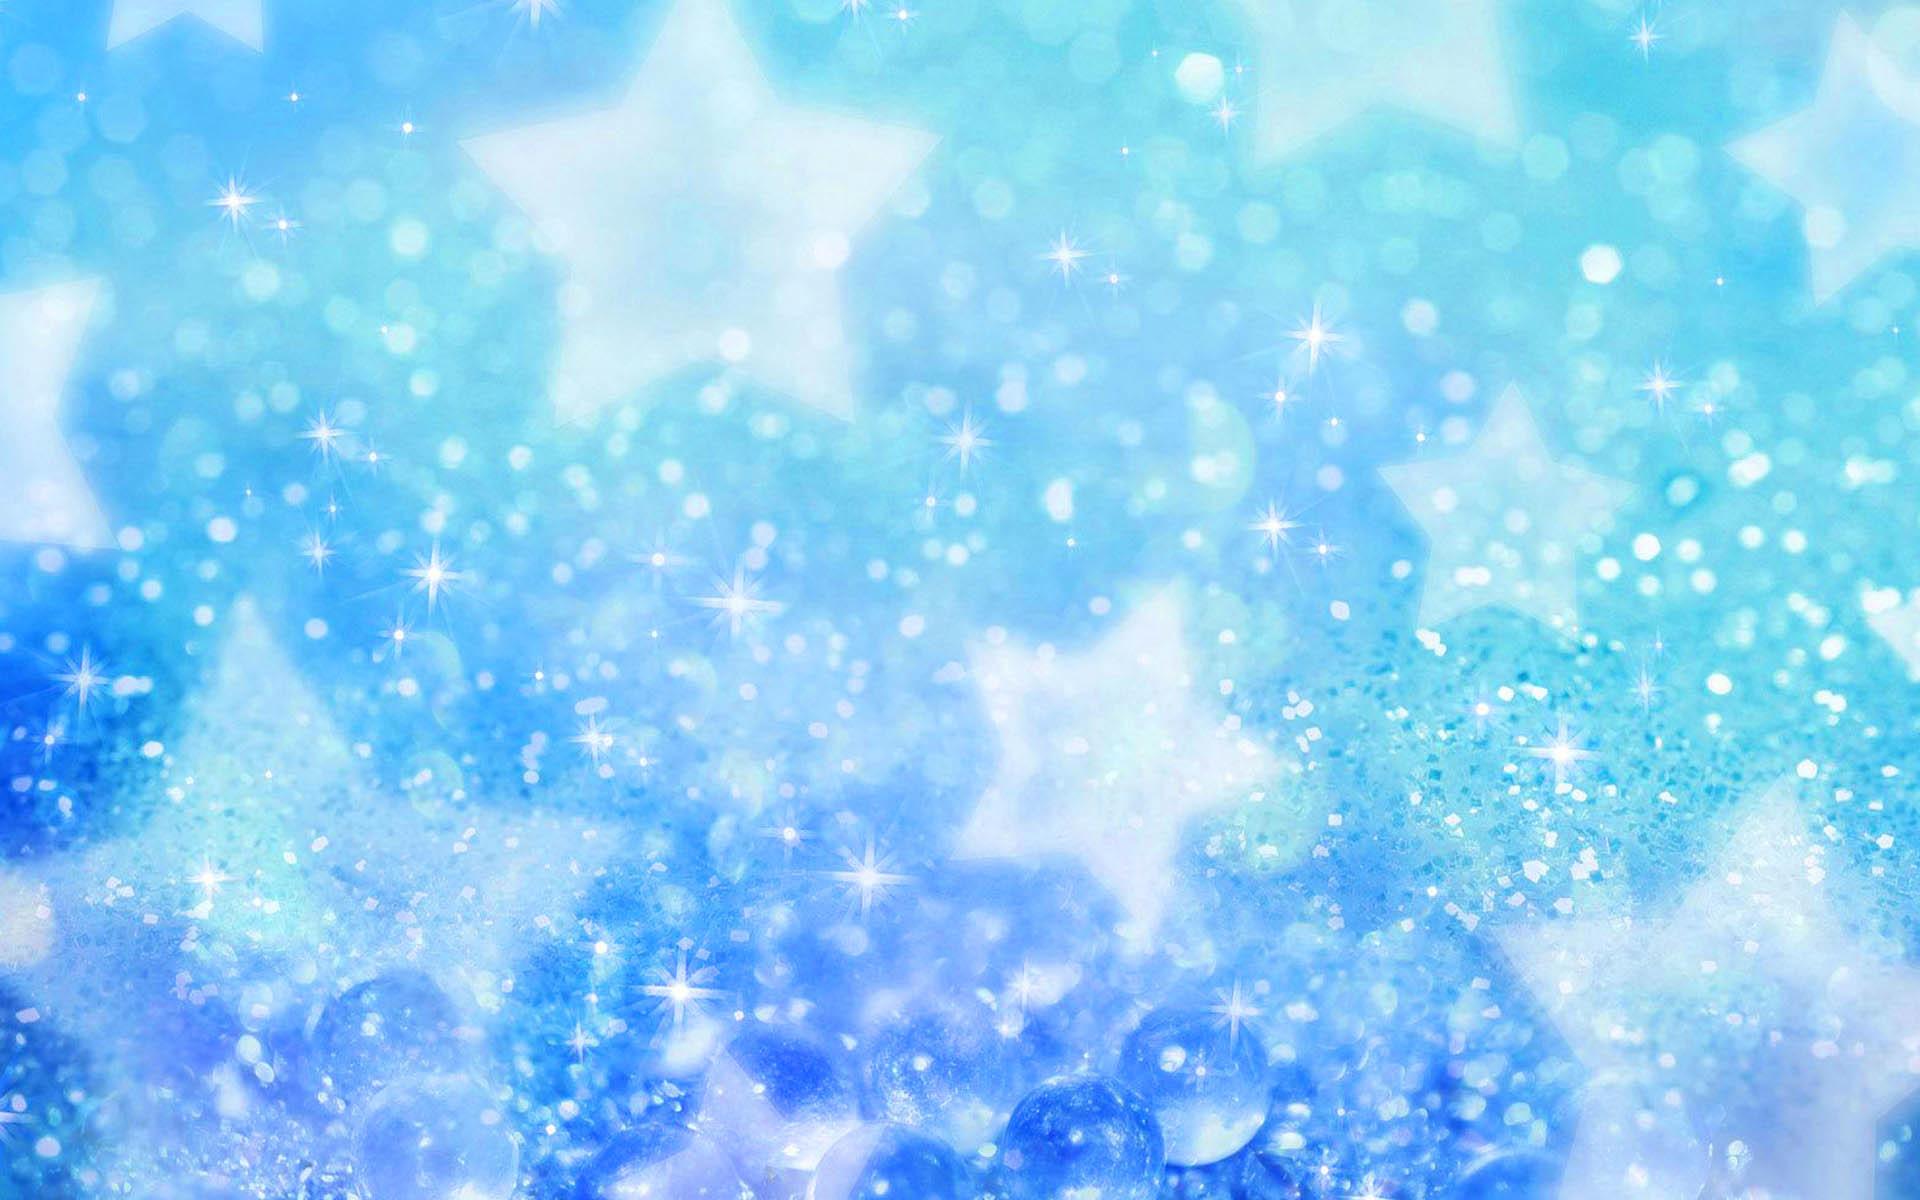 Glitter Desktop Wallpaper (61+ images)